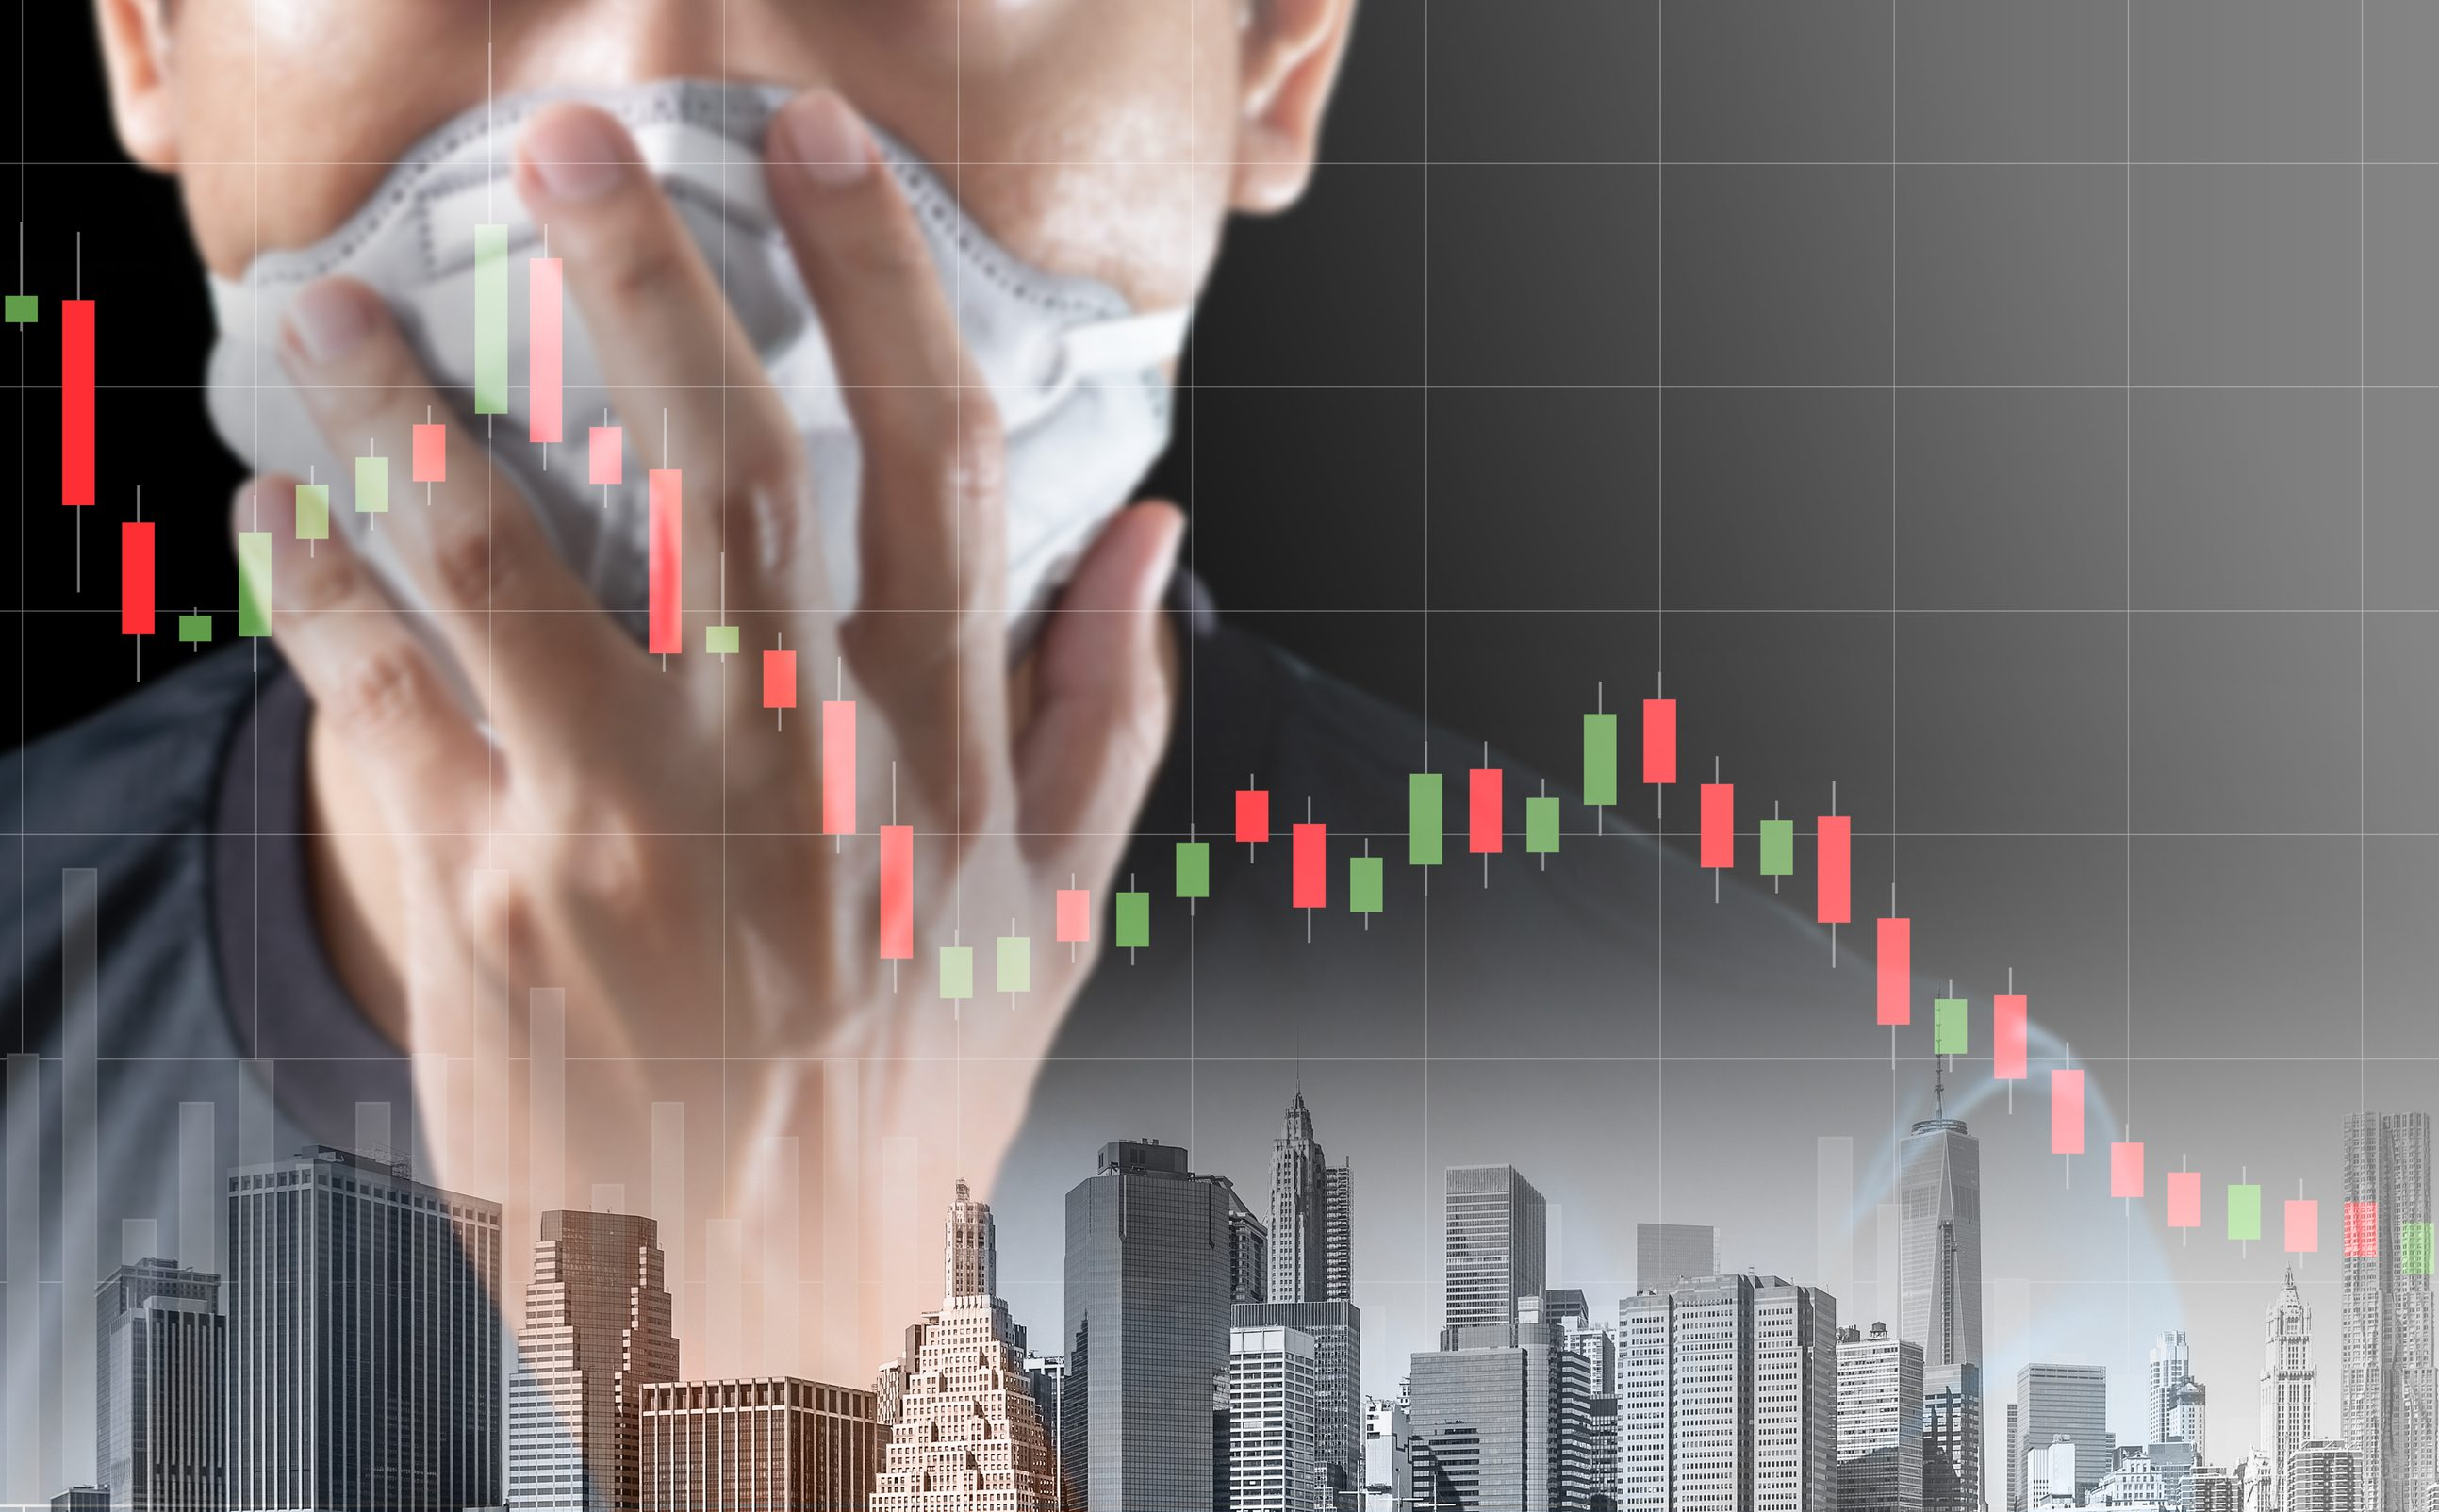 картинки по экономическому кризису салон